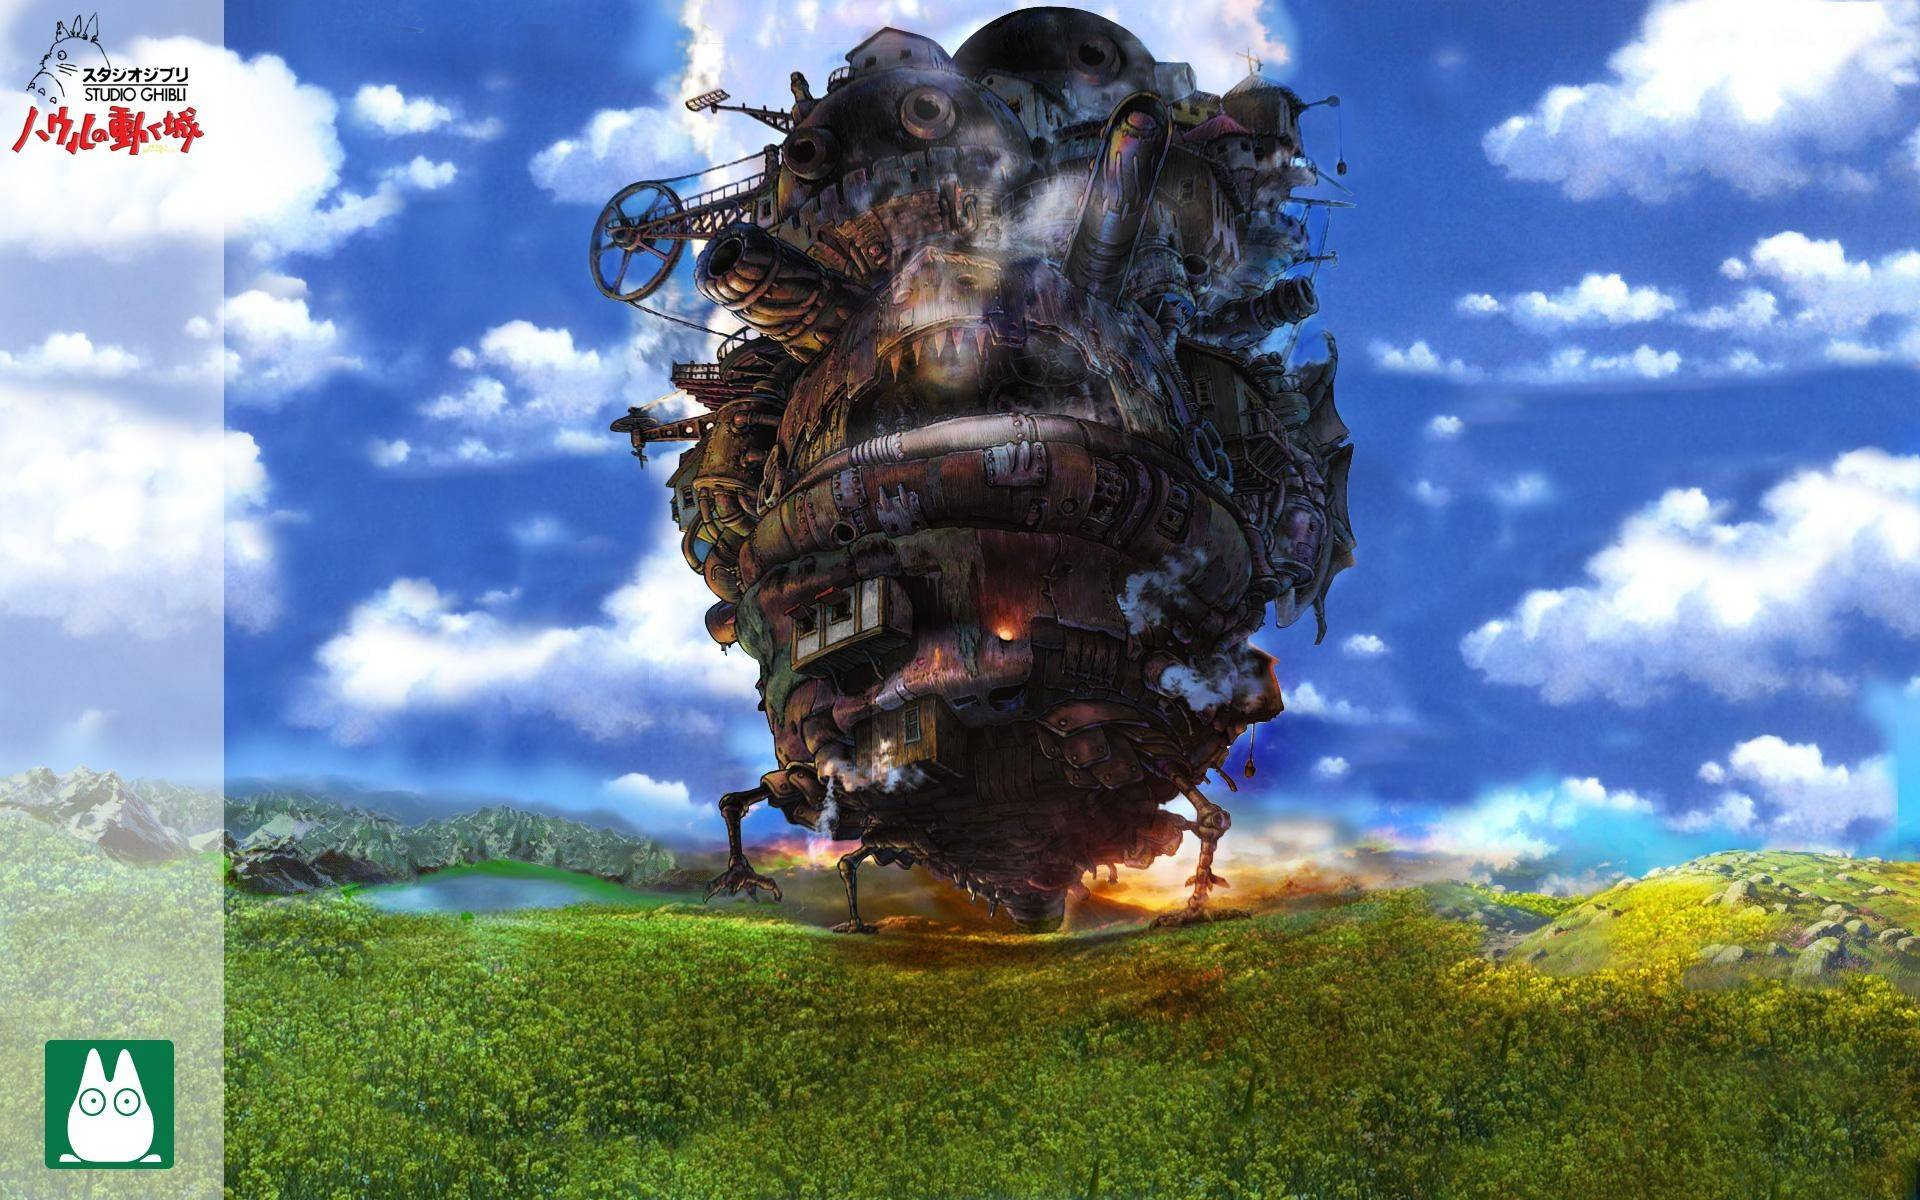 Hayao Miyazaki 19201200 Wallpaper 1714542 1920x1200